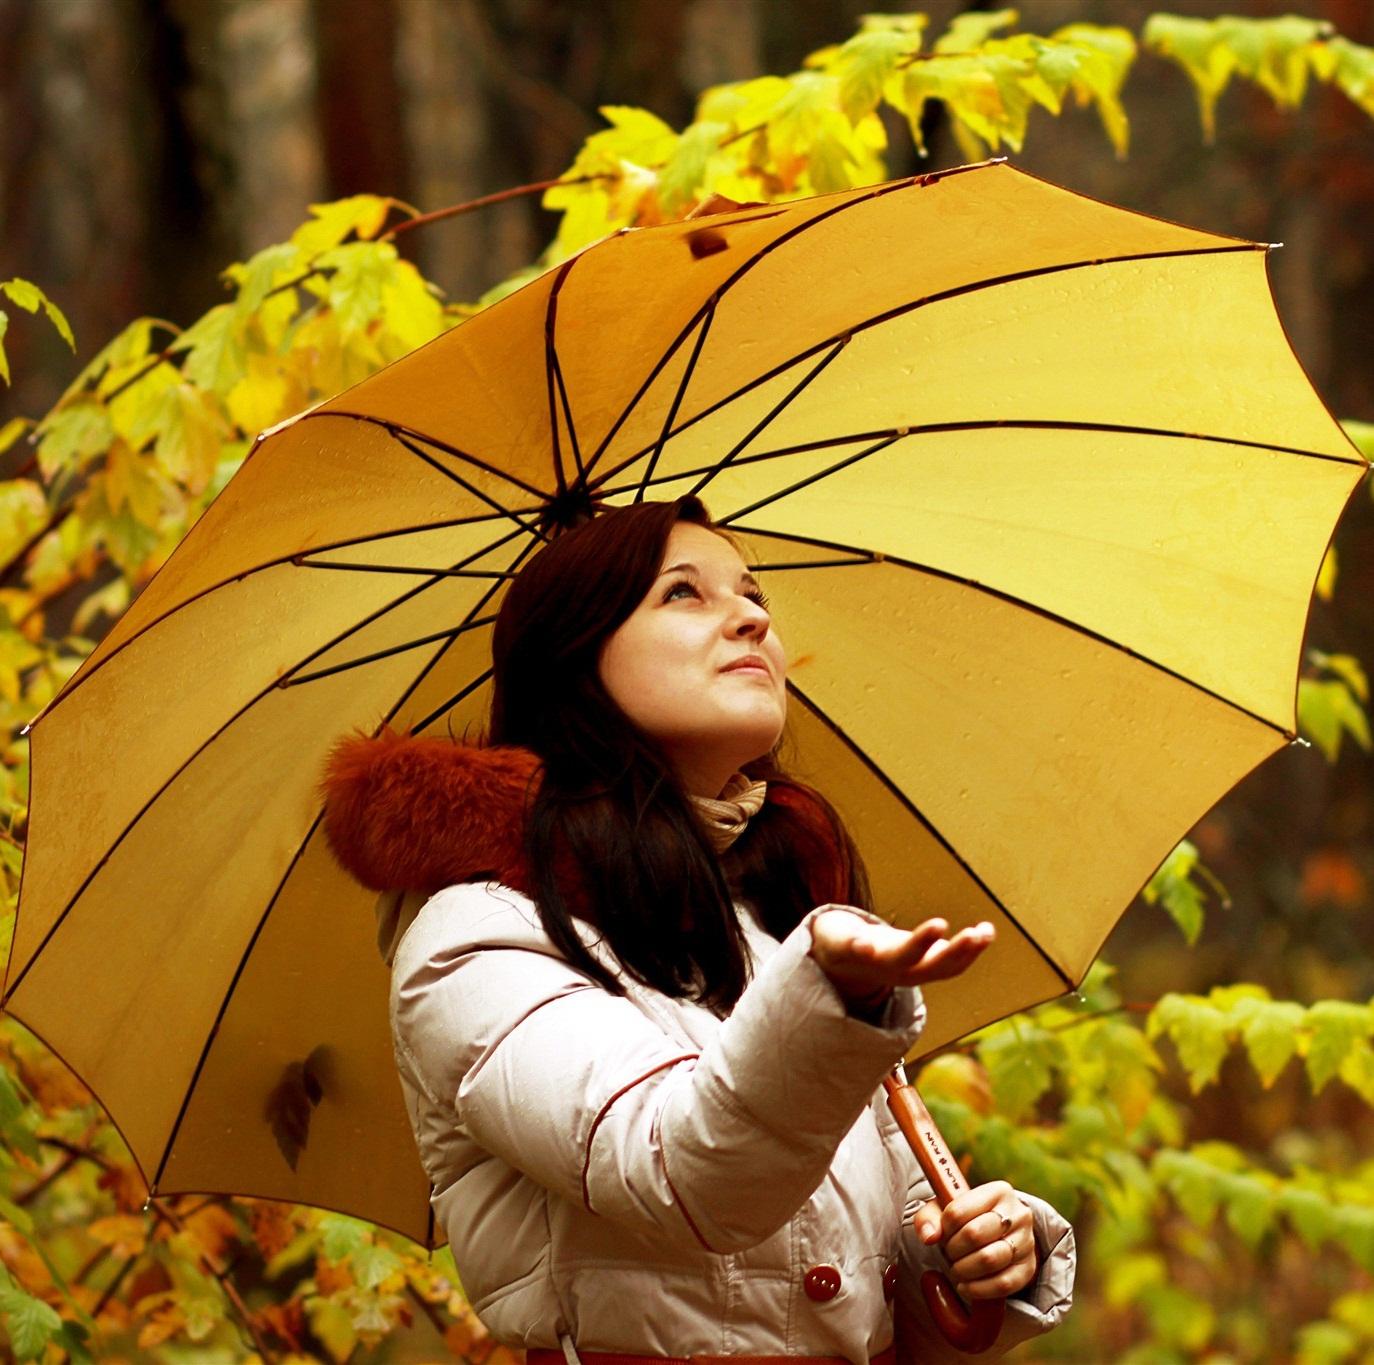 http://s8.picofile.com/file/8309797442/22Reqsane_ismayilova_Yagish_Yagir.jpg